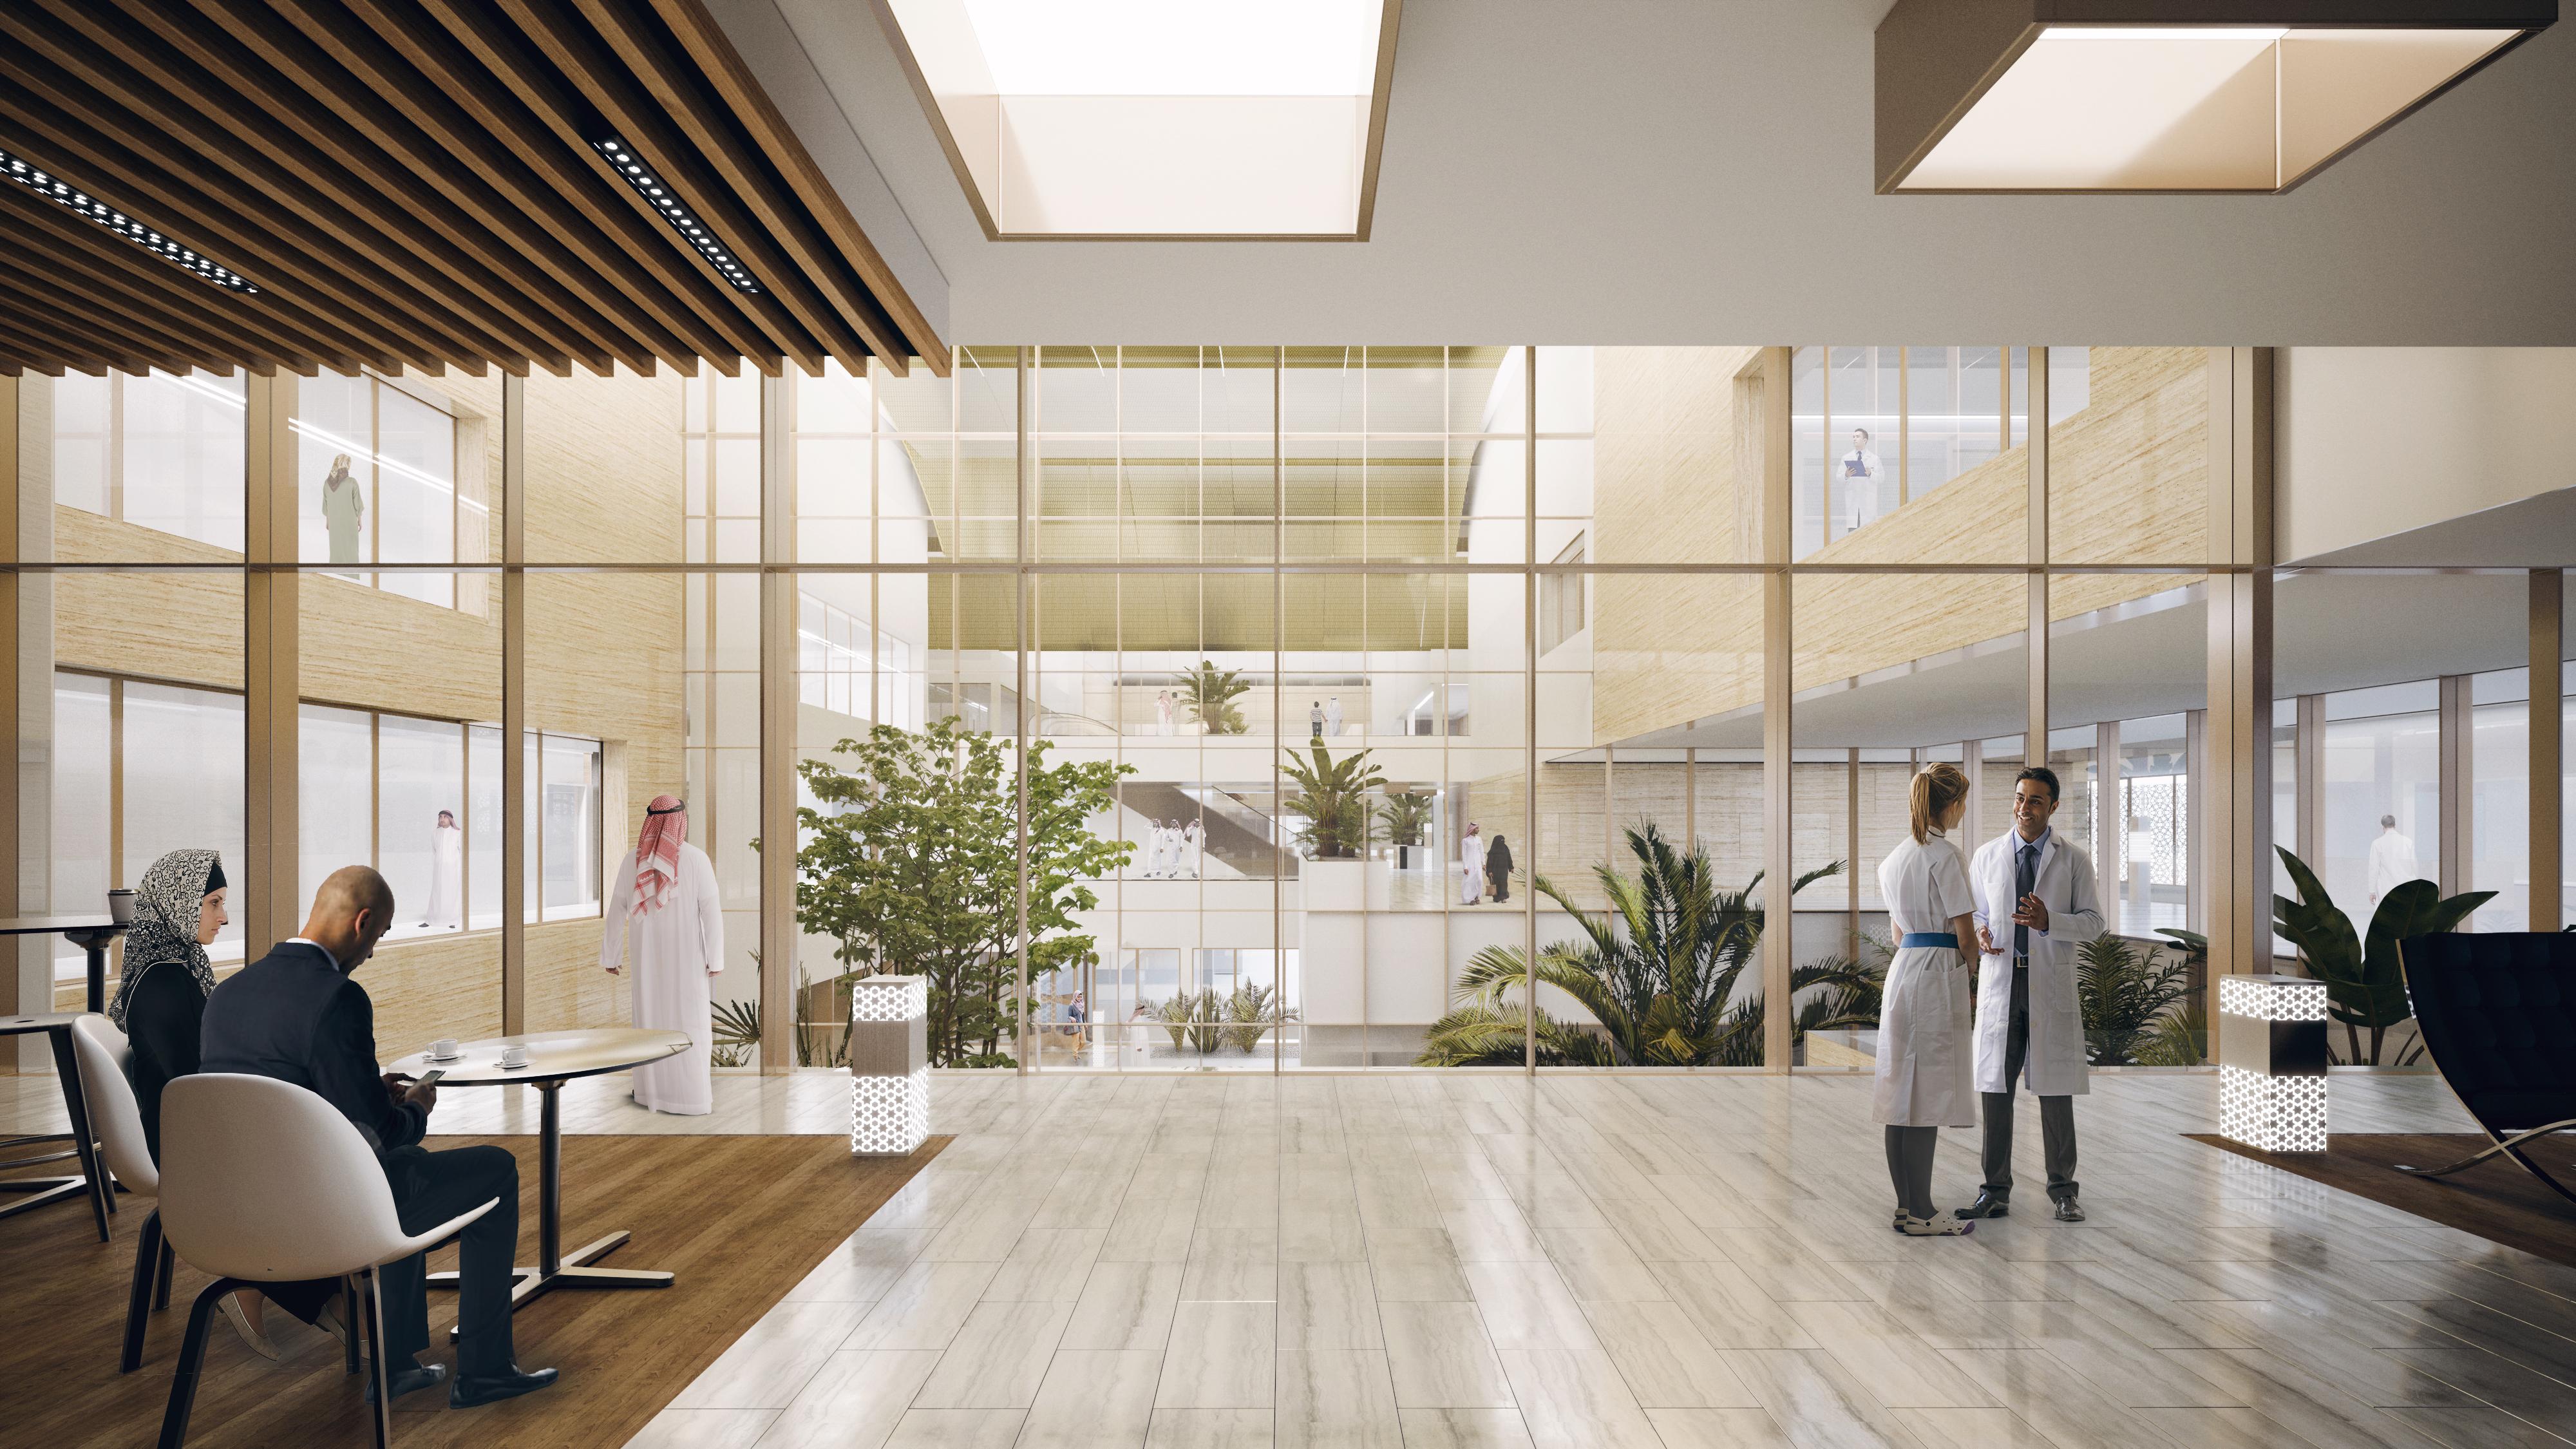 Design impacts wellness! Experts from GAJ, dwp, Summertown